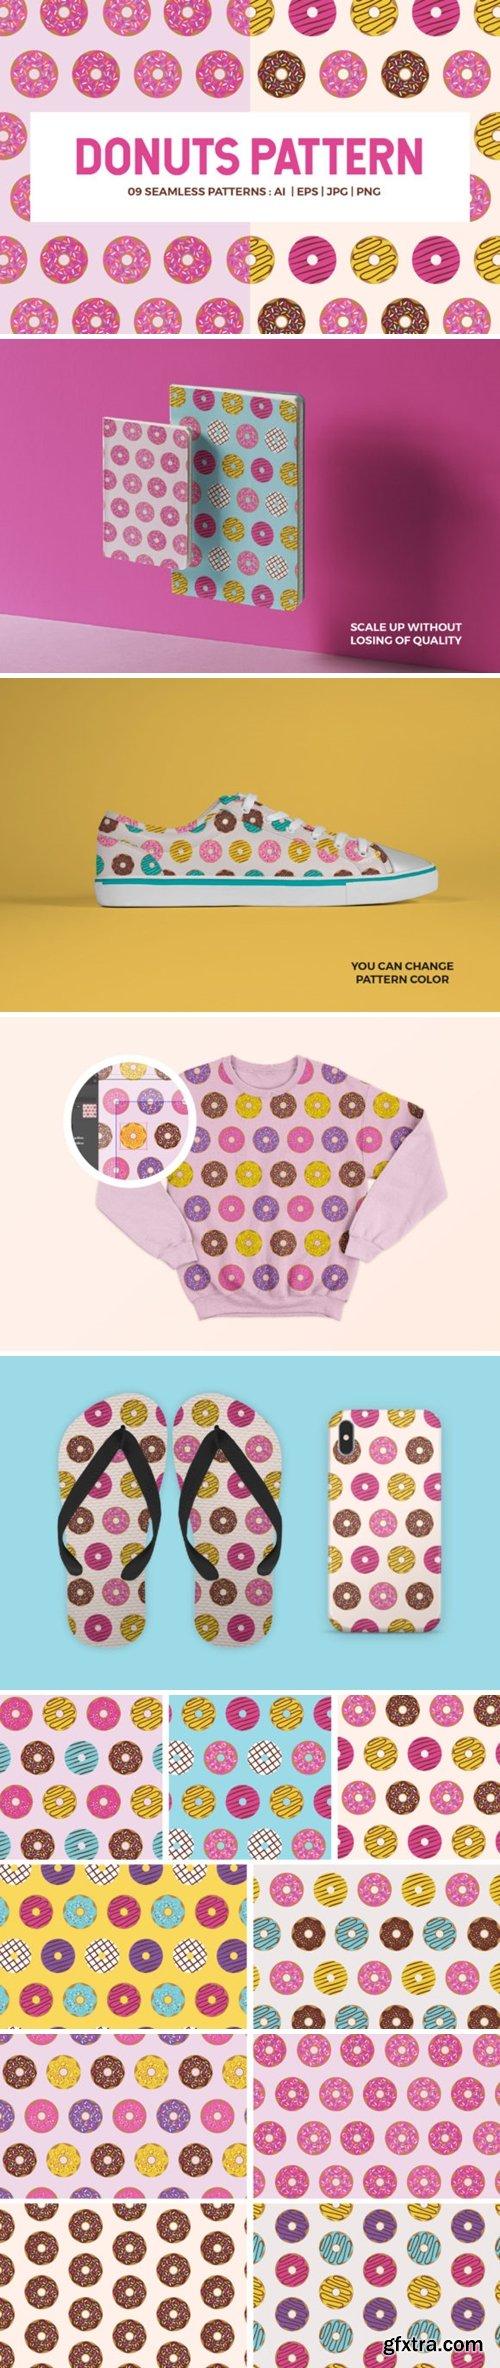 Donuts Seamless Patterns 1738504